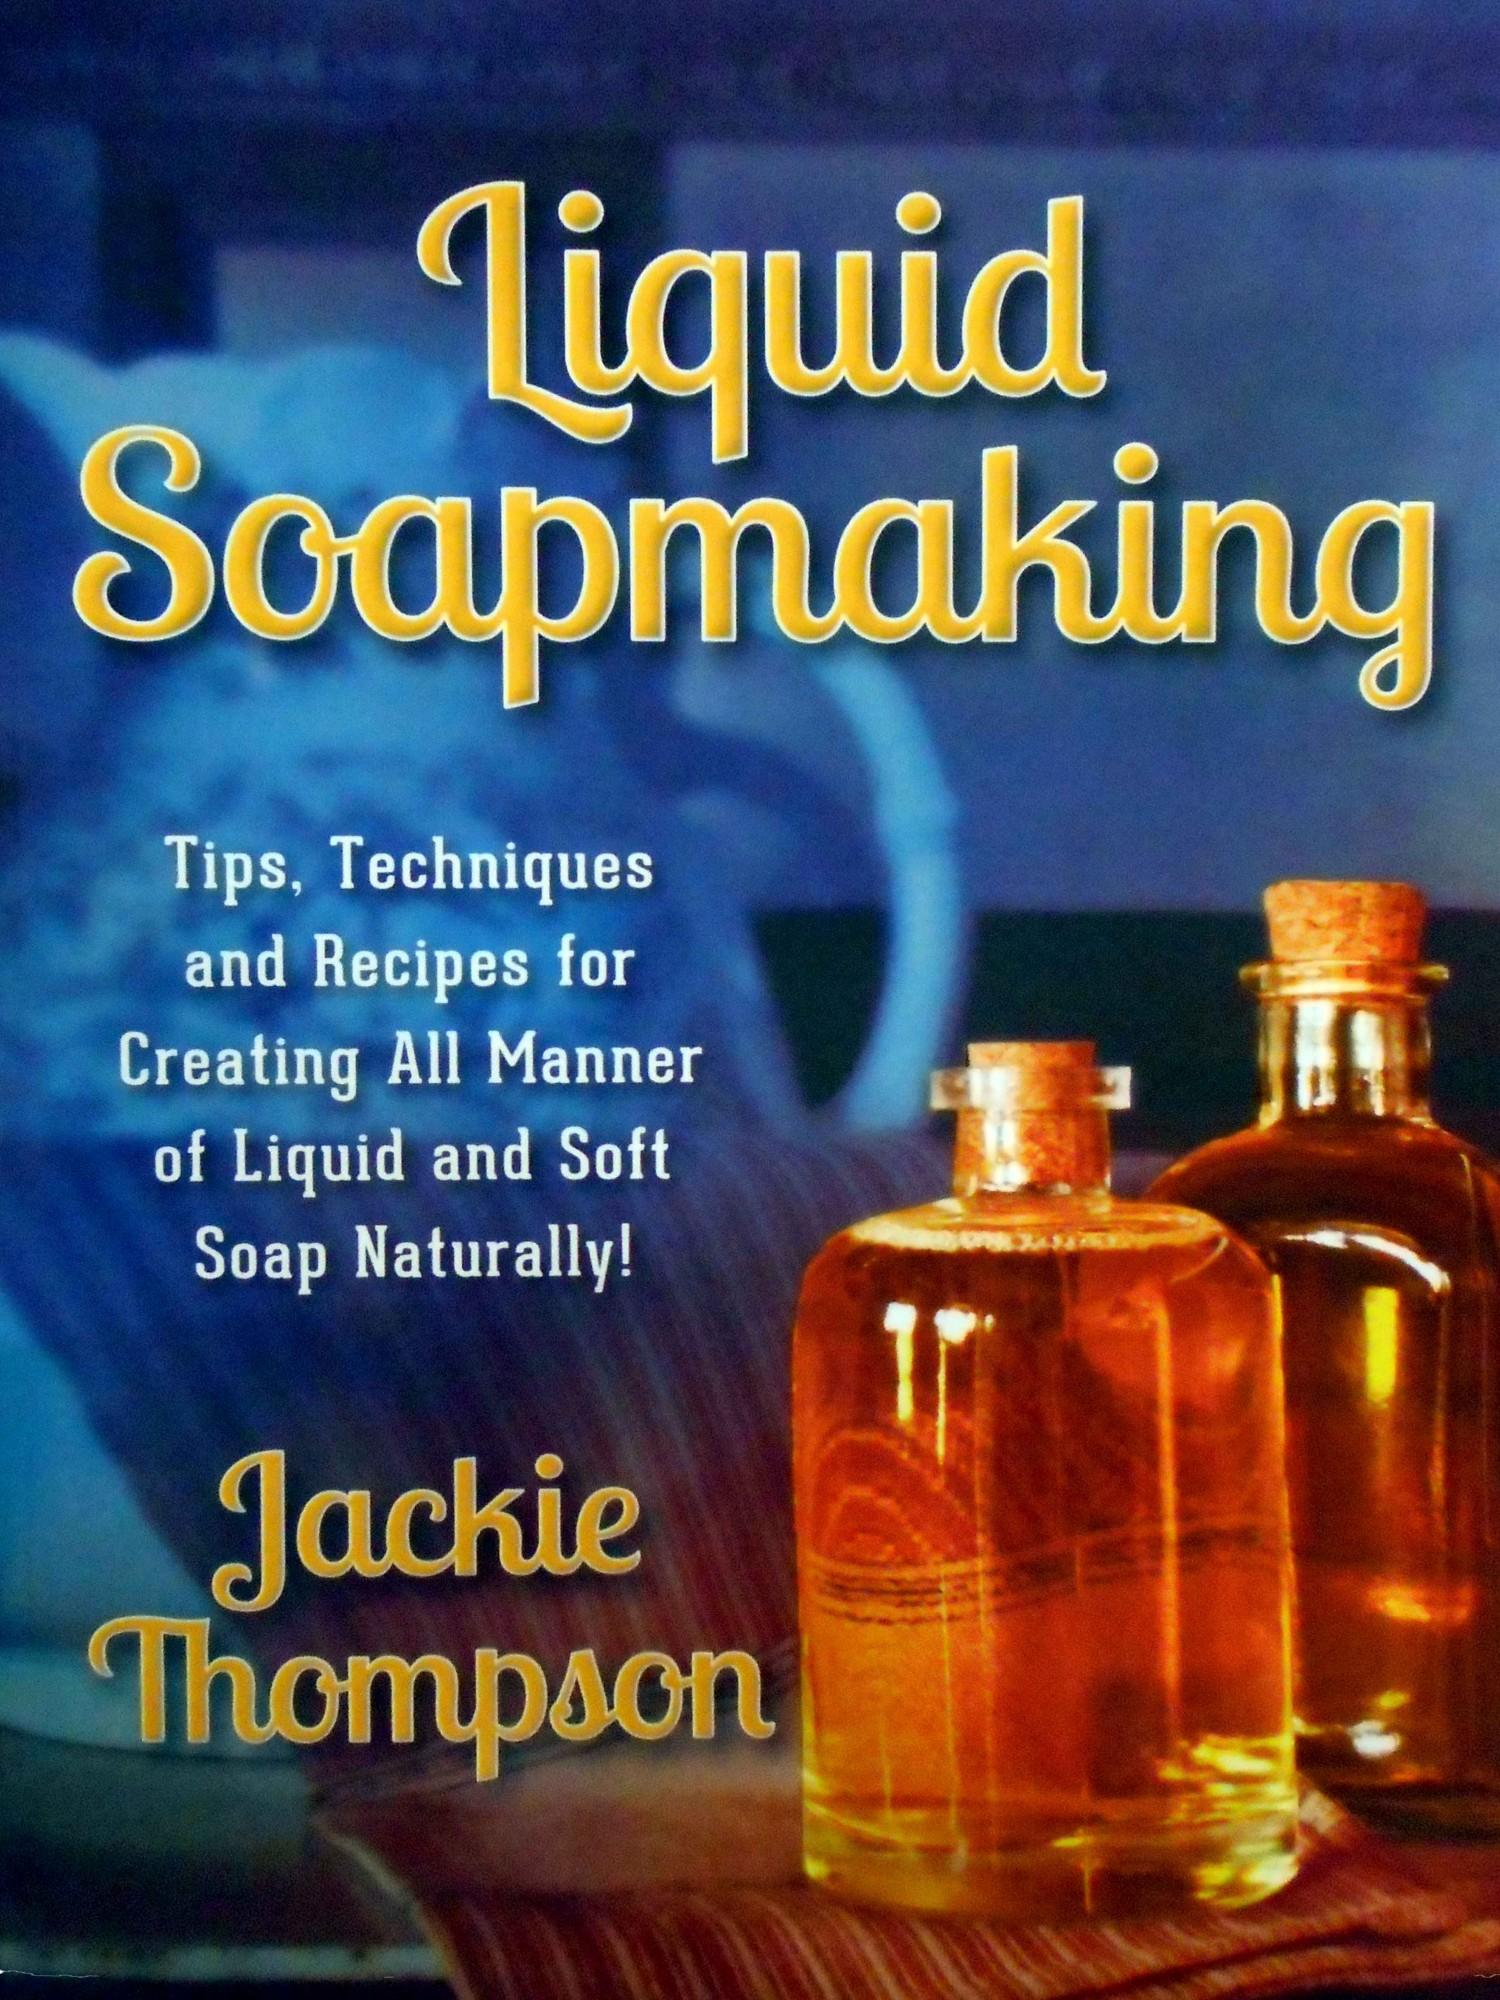 liquid-soap-jackie